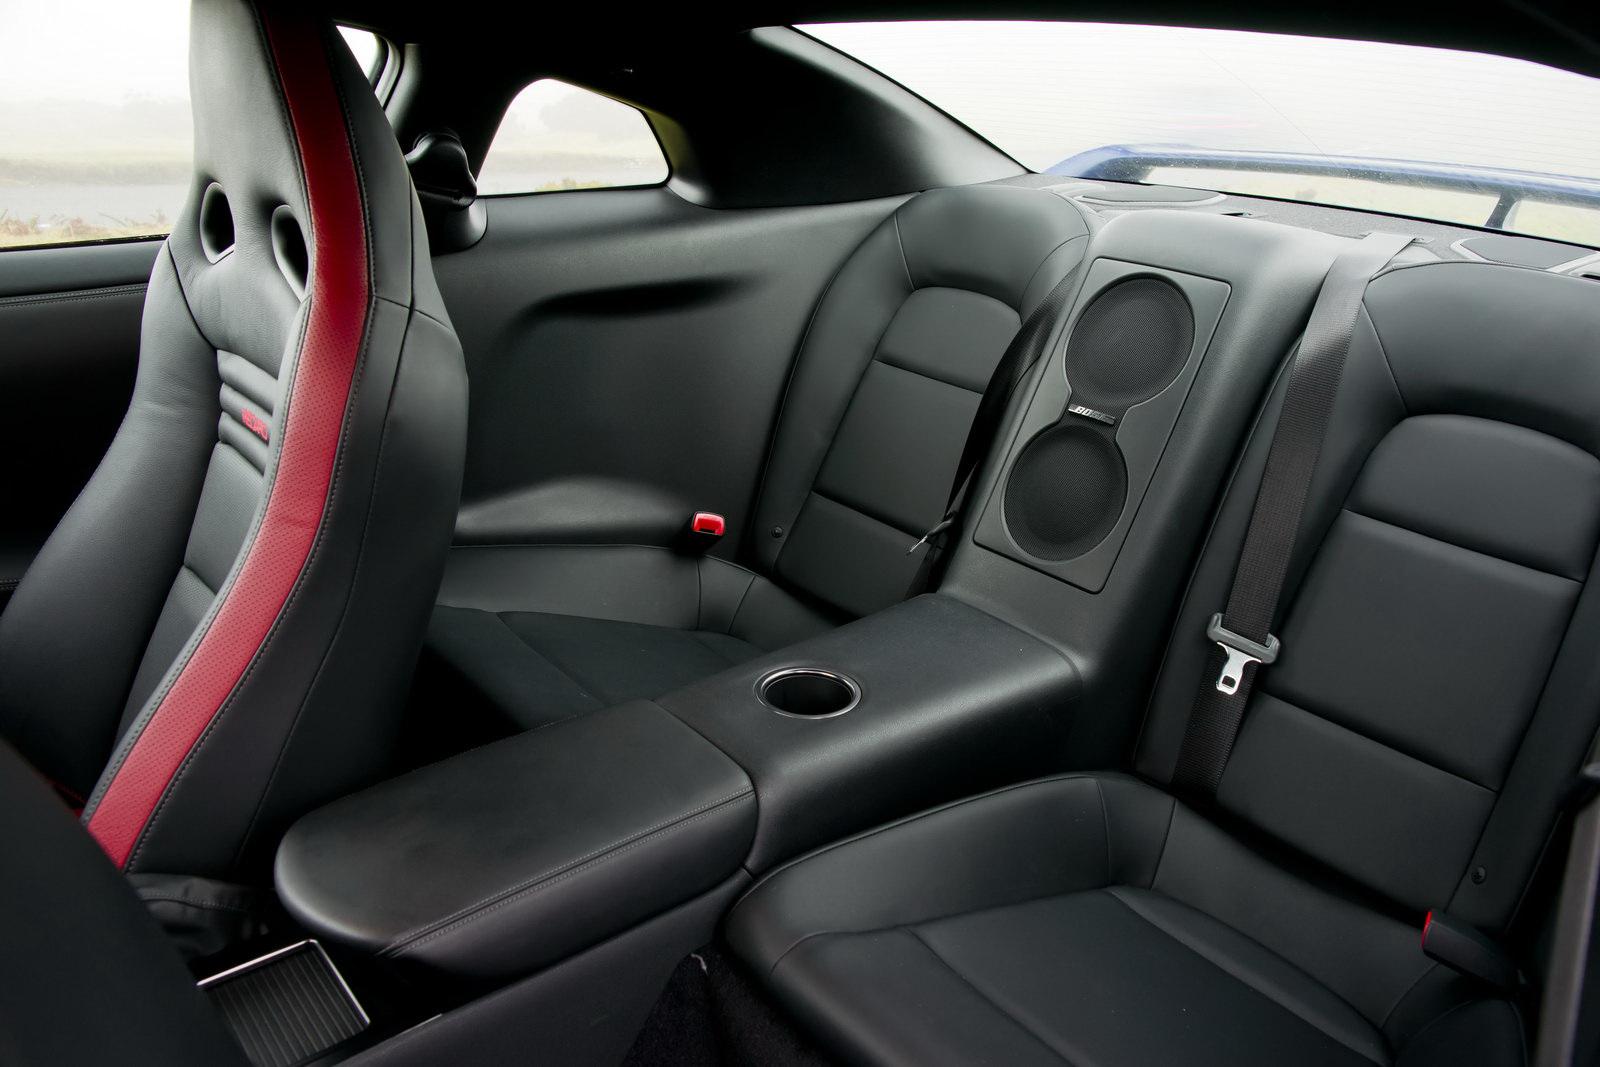 Seat Belt Extender For Cars Nissan gtr rear seat #10